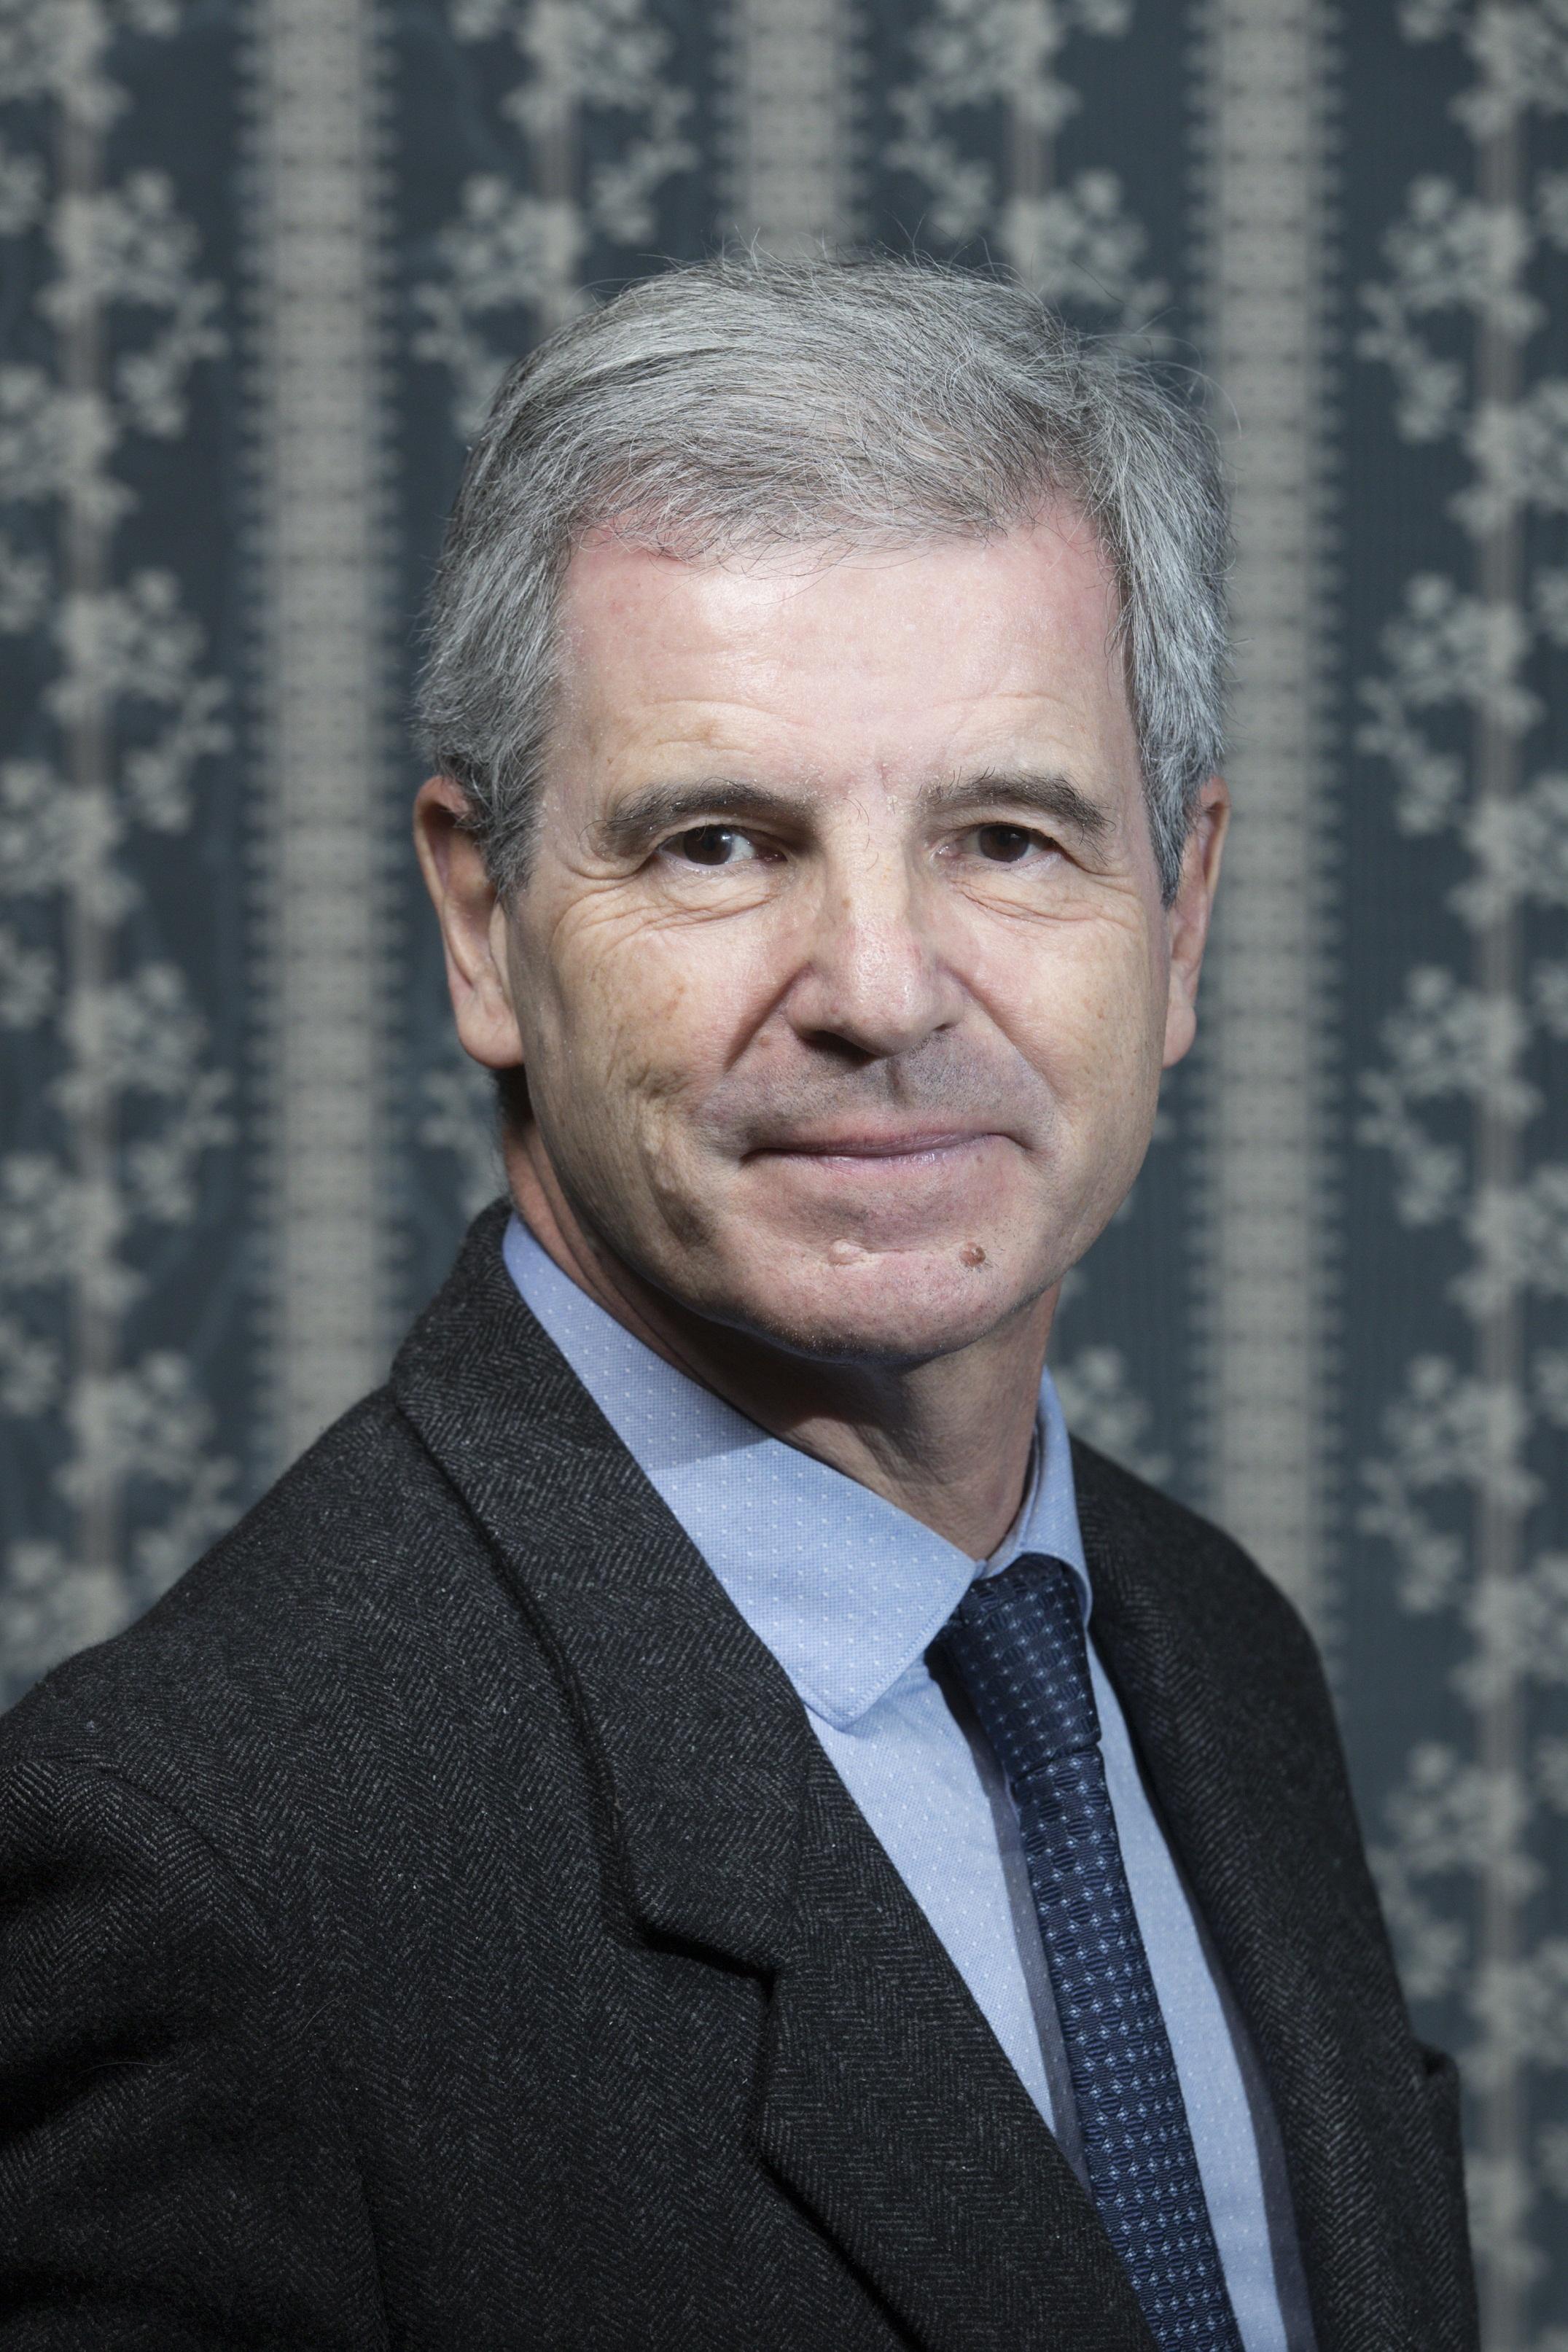 Frank Natali